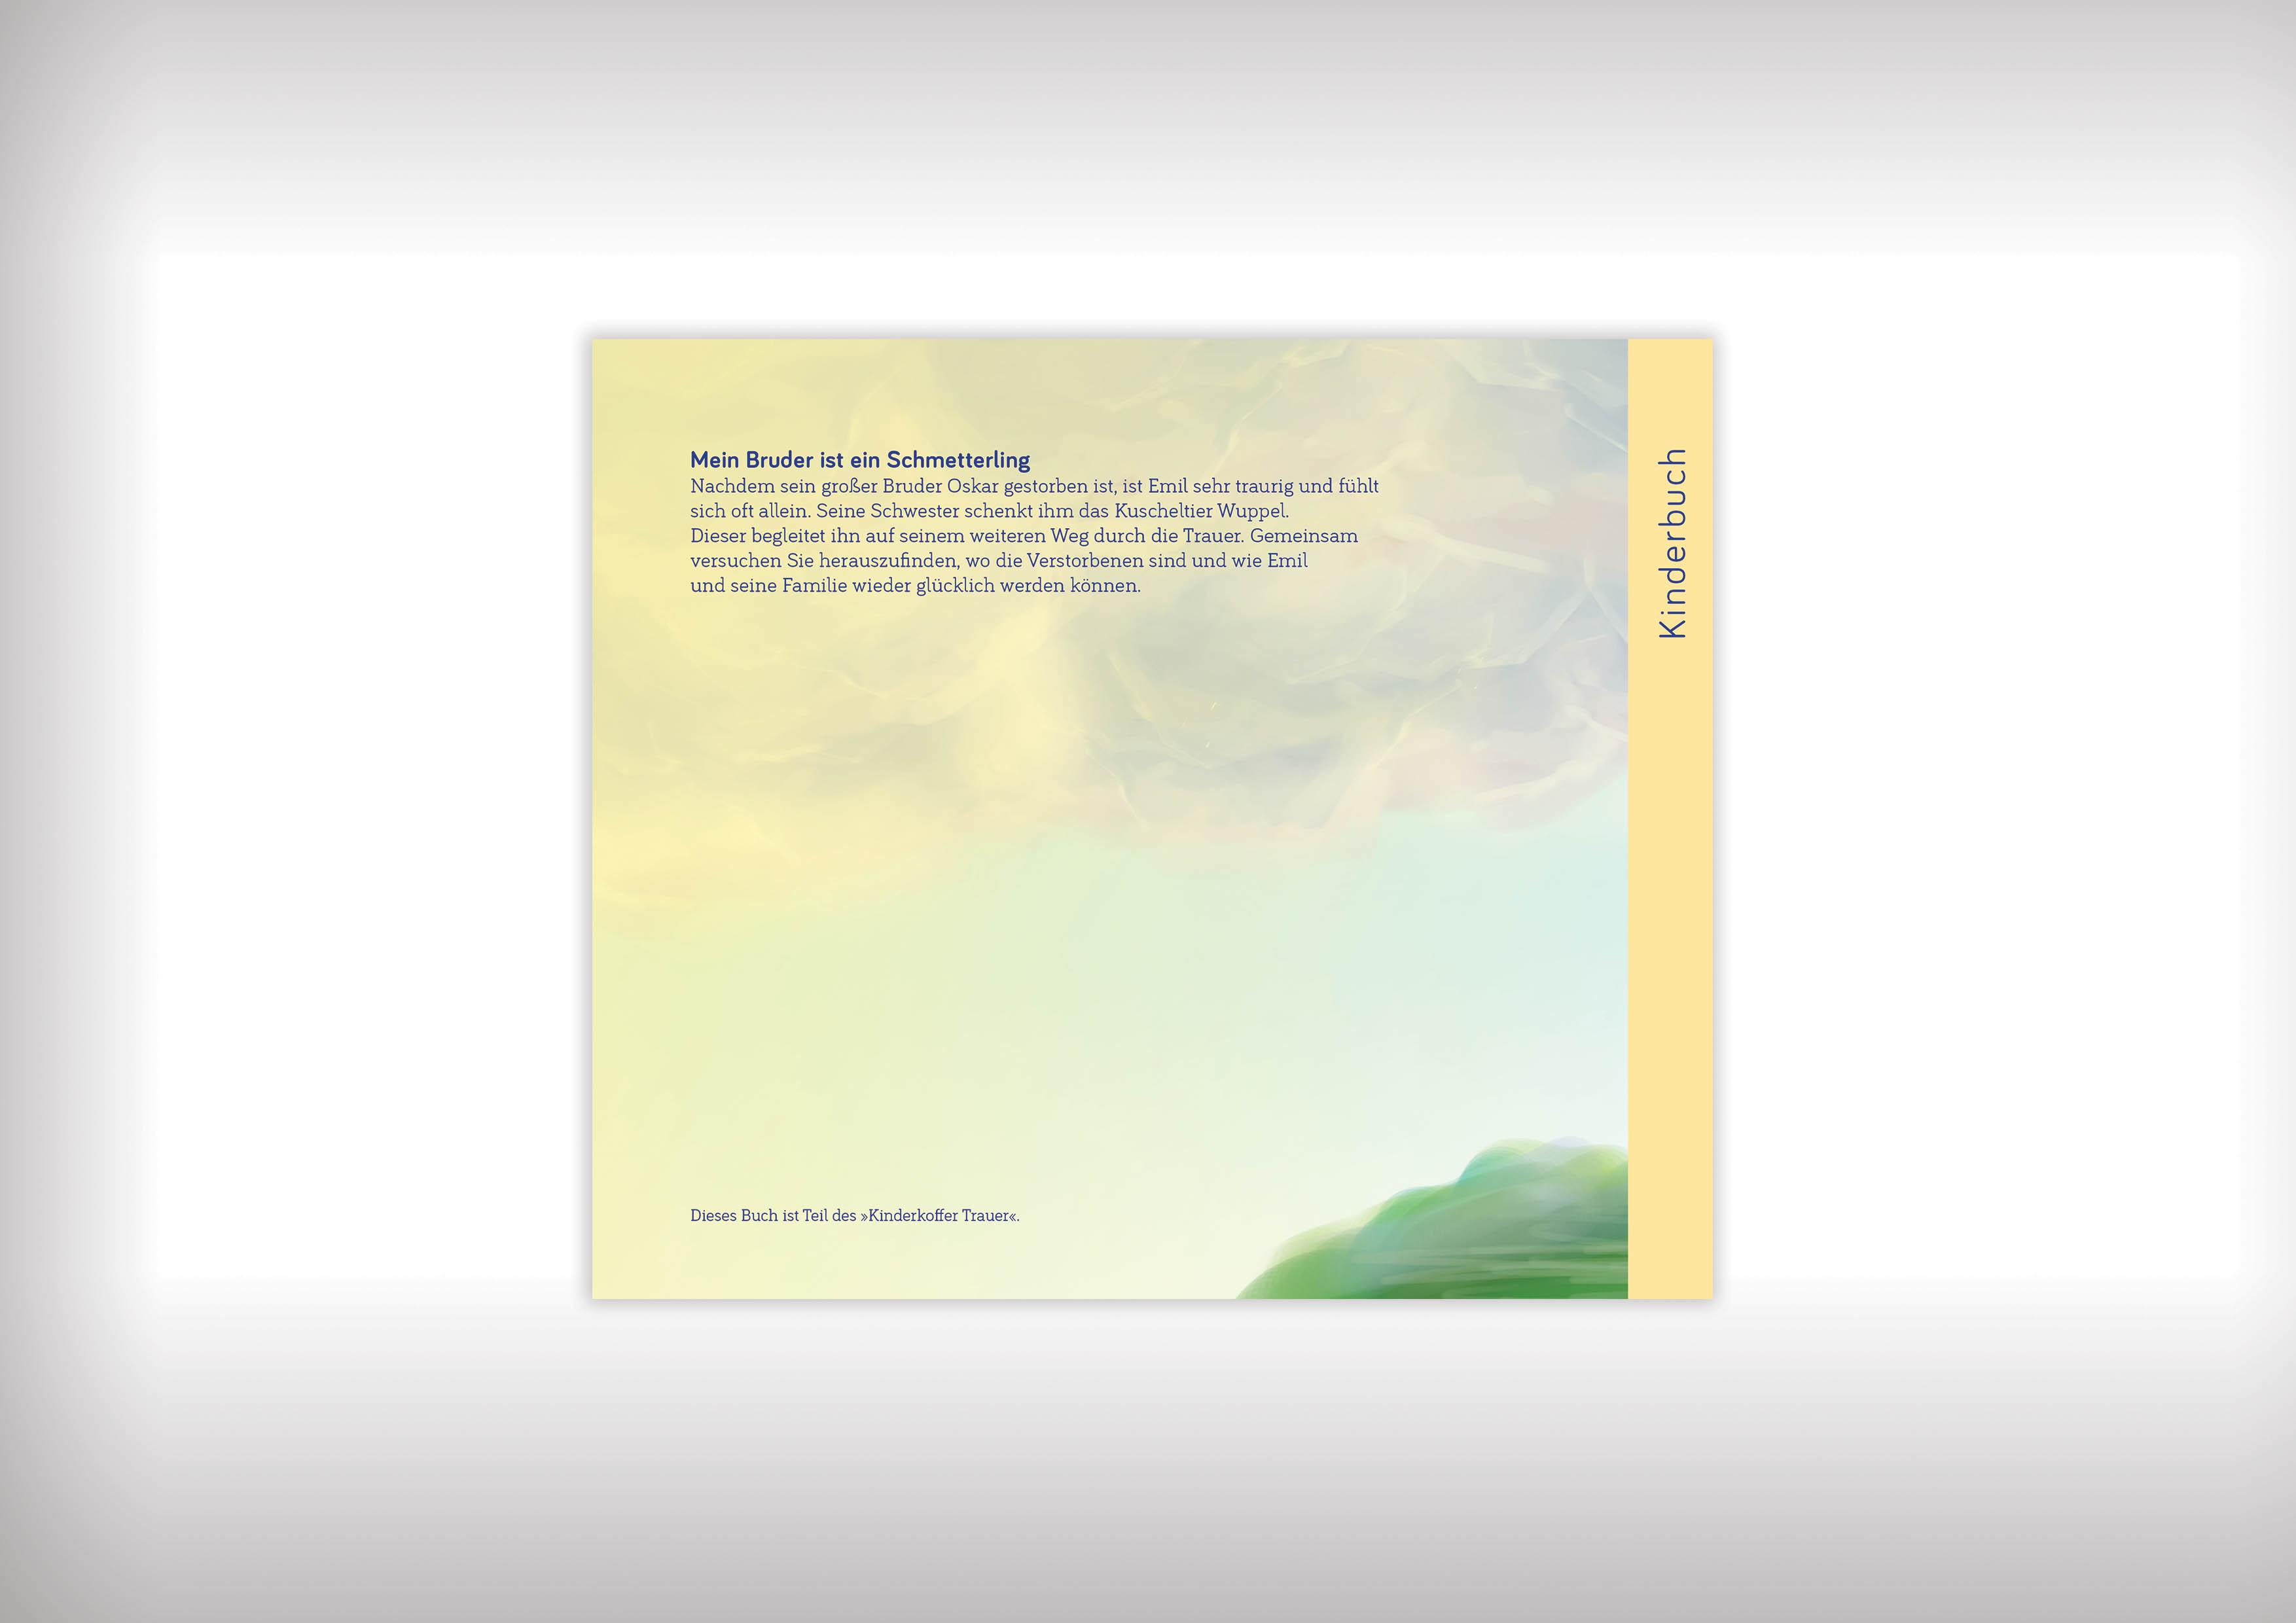 Kinderbuch_Mockup_01 MERGED_0035_Ruecken